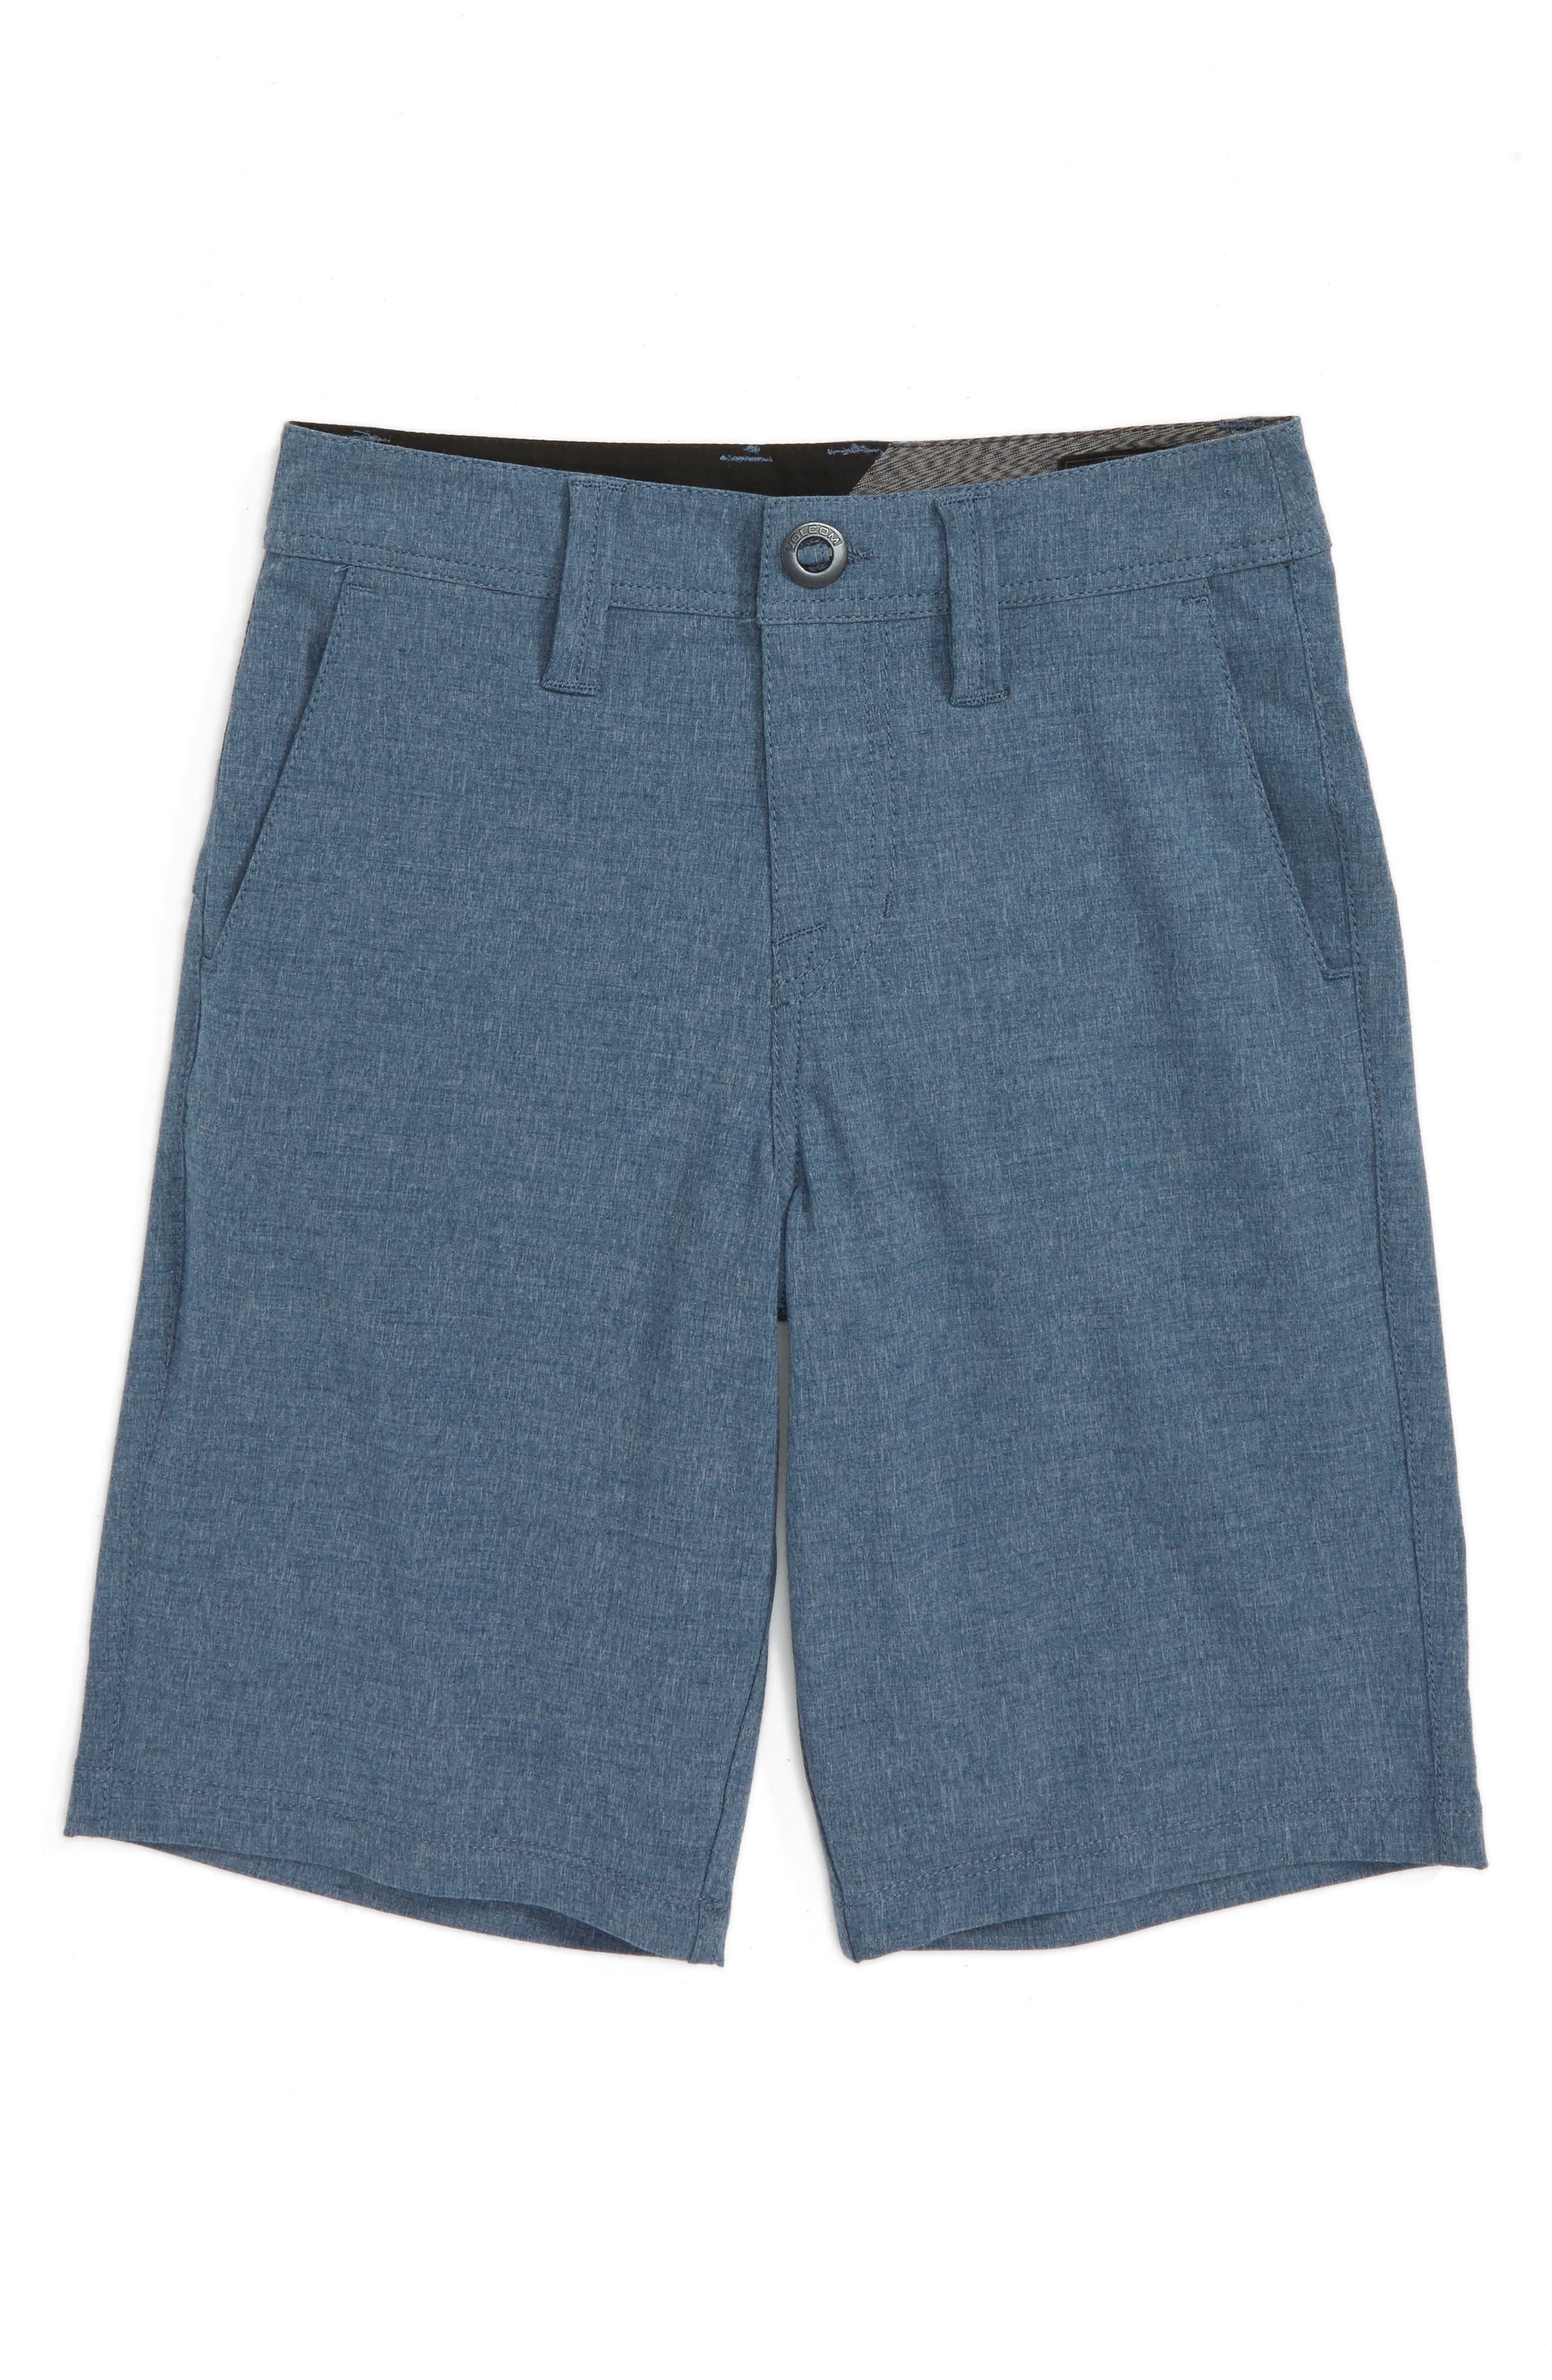 Surf N' Turf Static Hybrid Shorts,                             Main thumbnail 1, color,                             Indigo